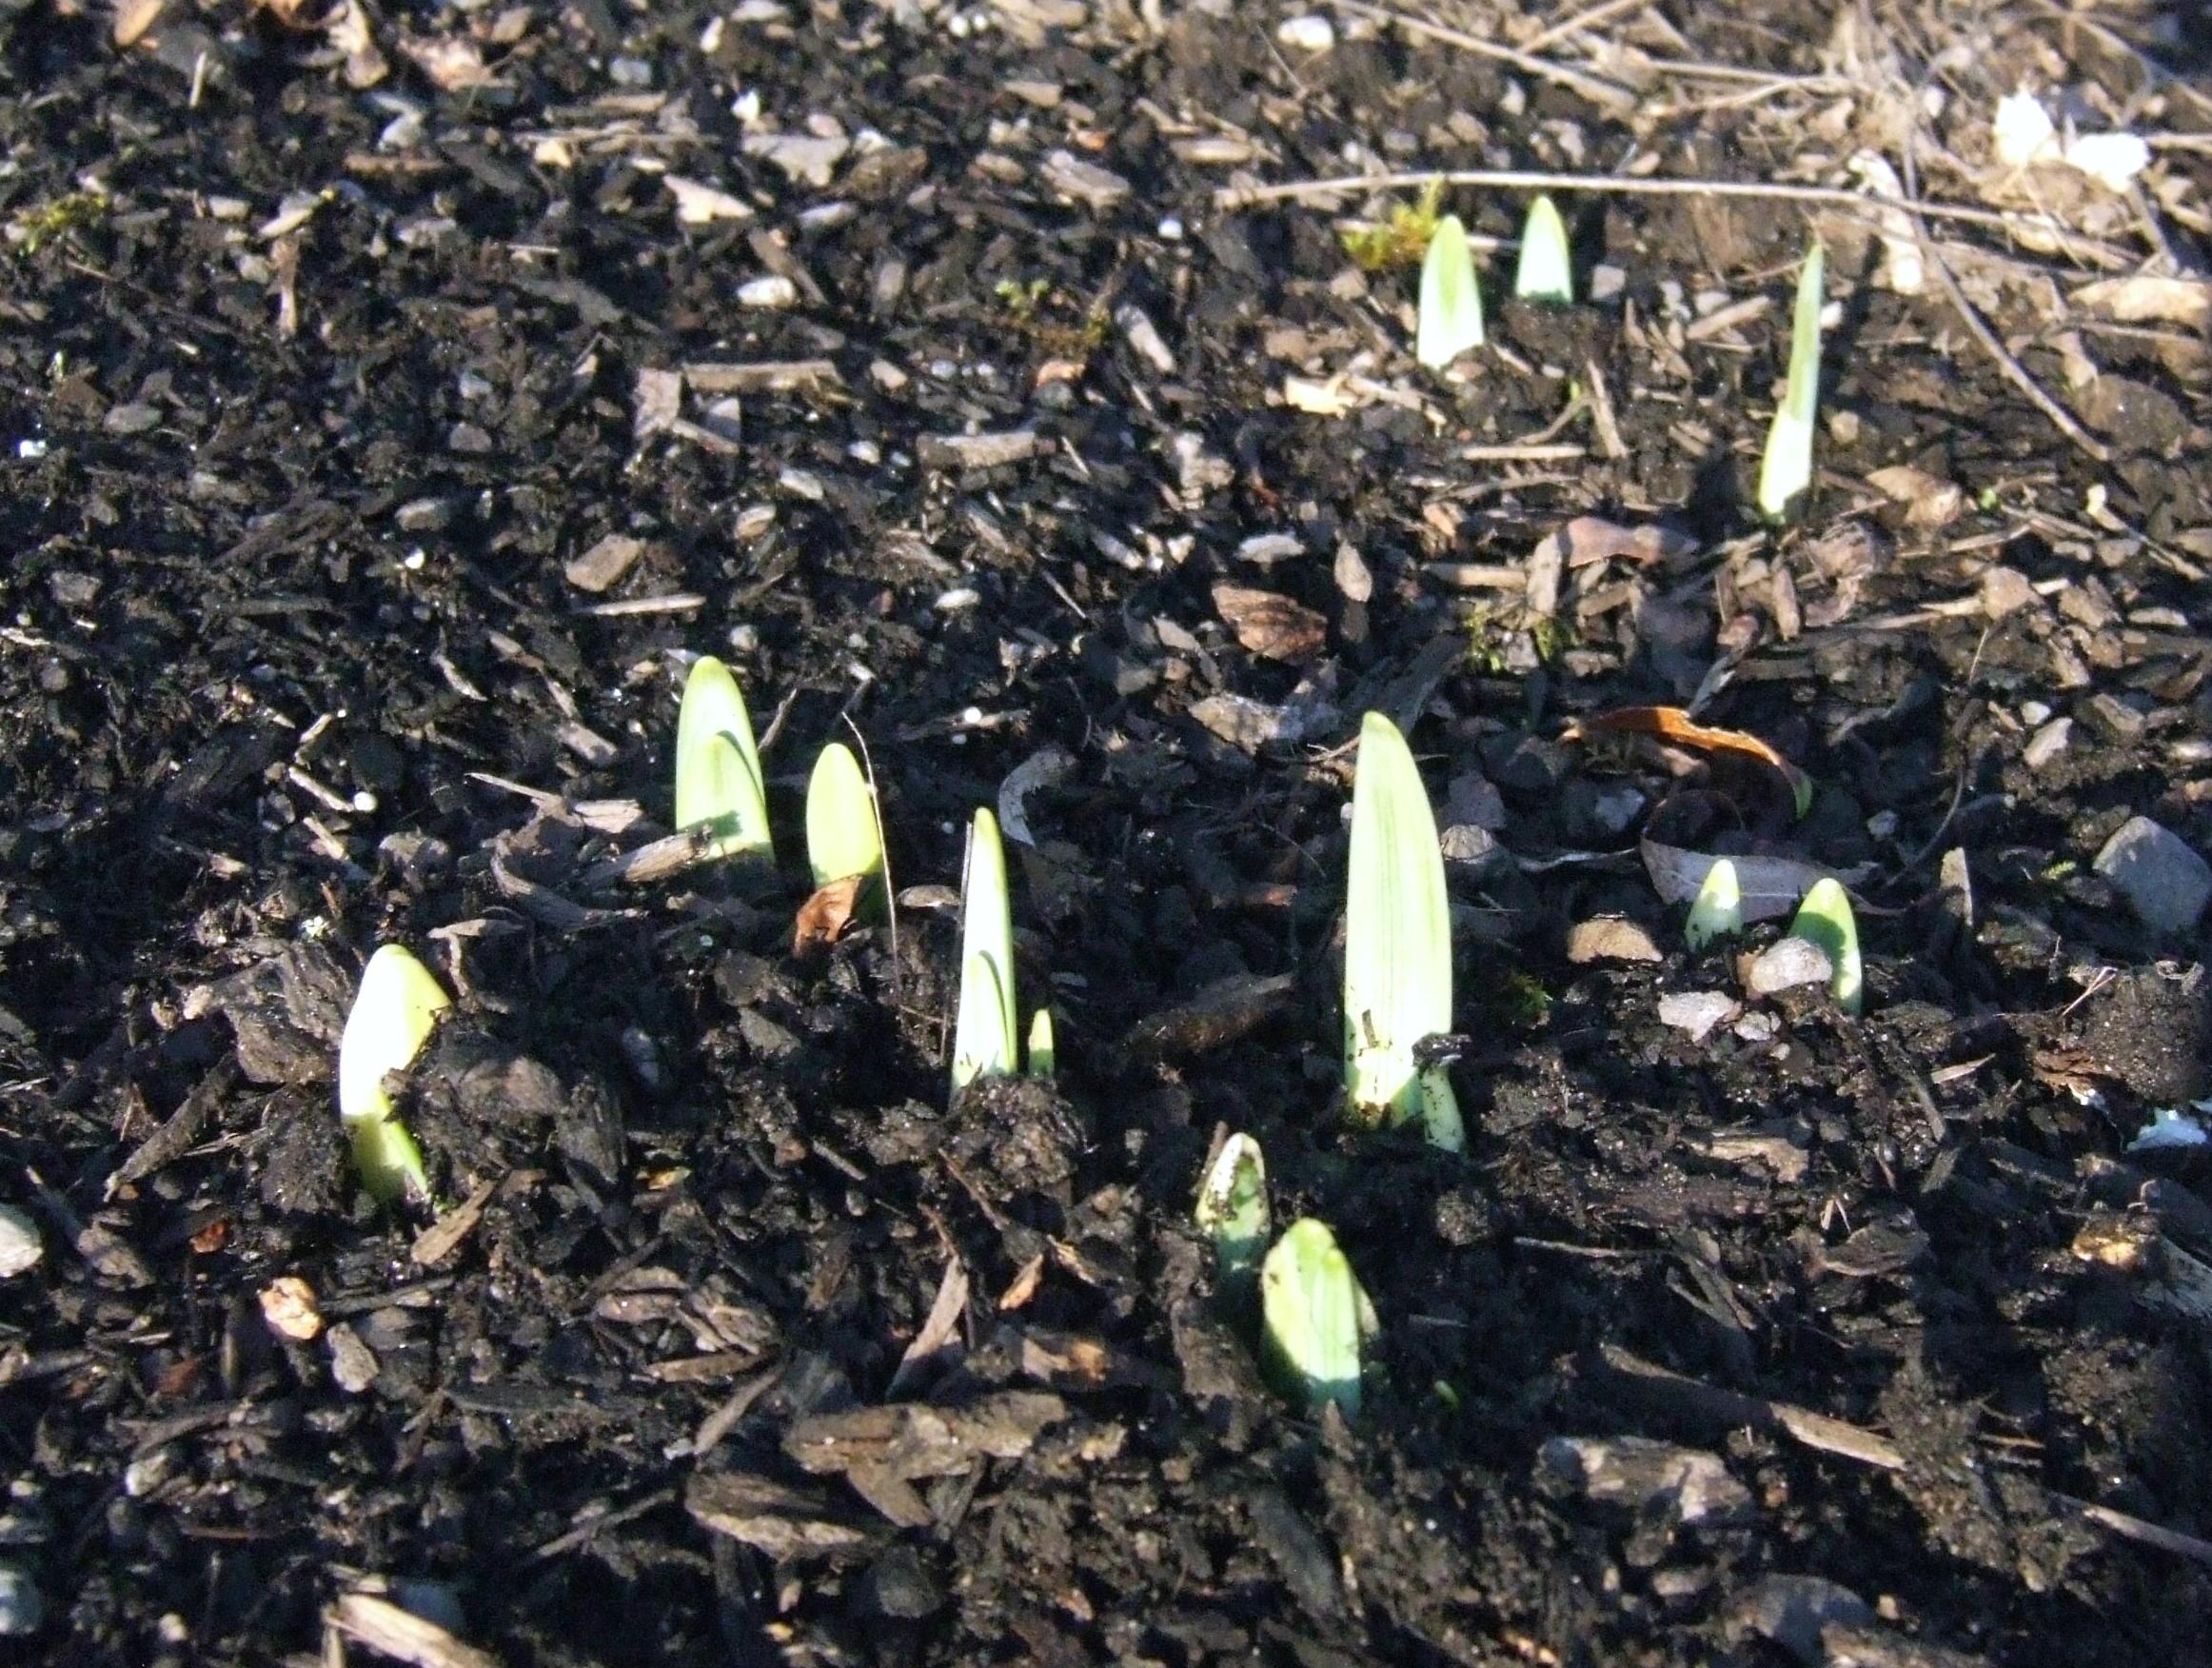 daffodils poking up